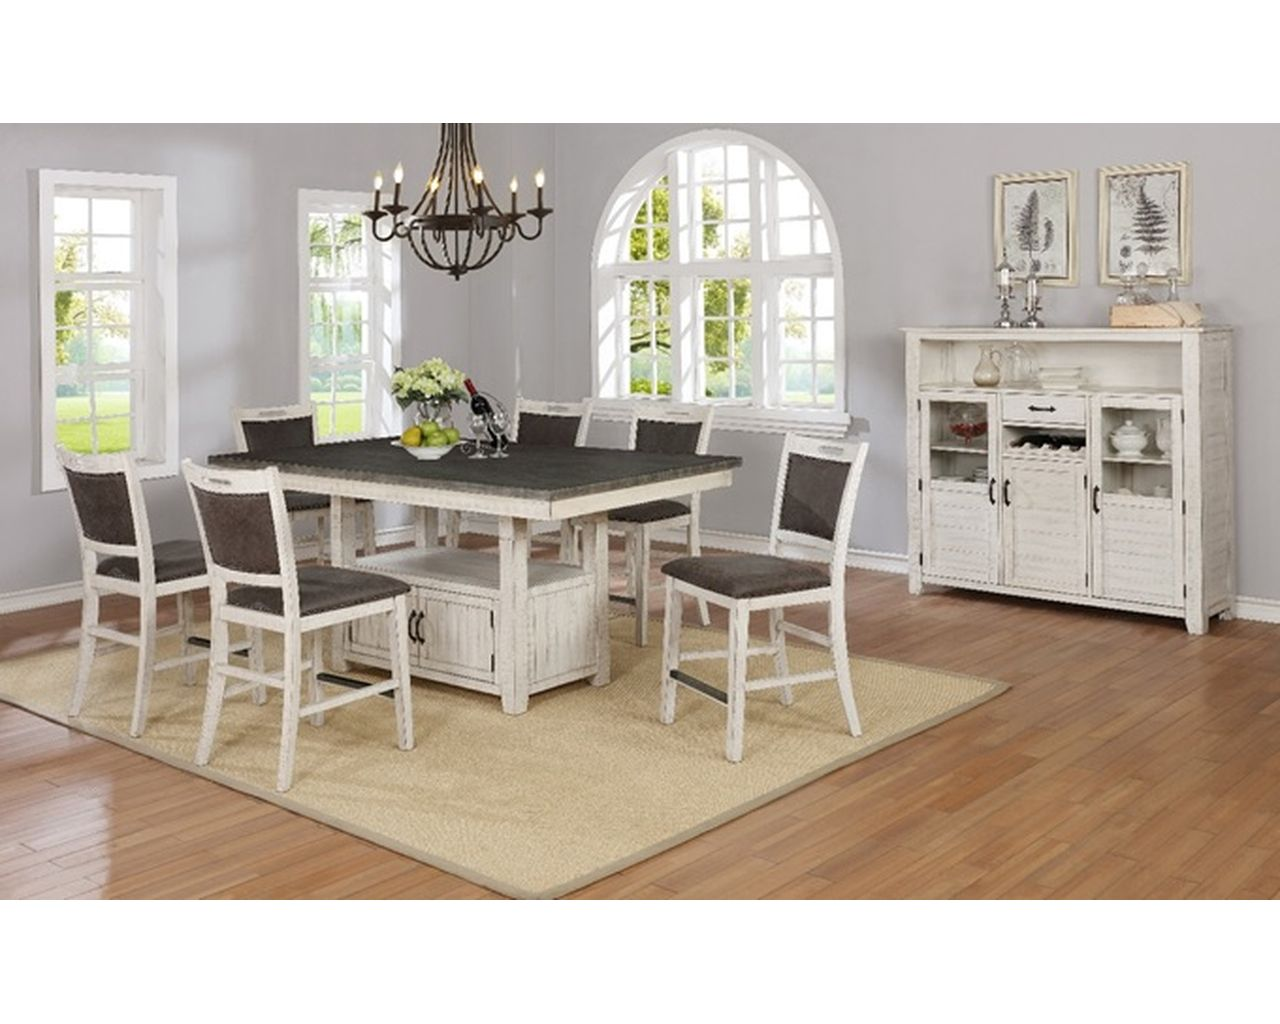 Timberidge Dining Set Gray White Factory Direct Furniture Store America The Beautiful Dreamer